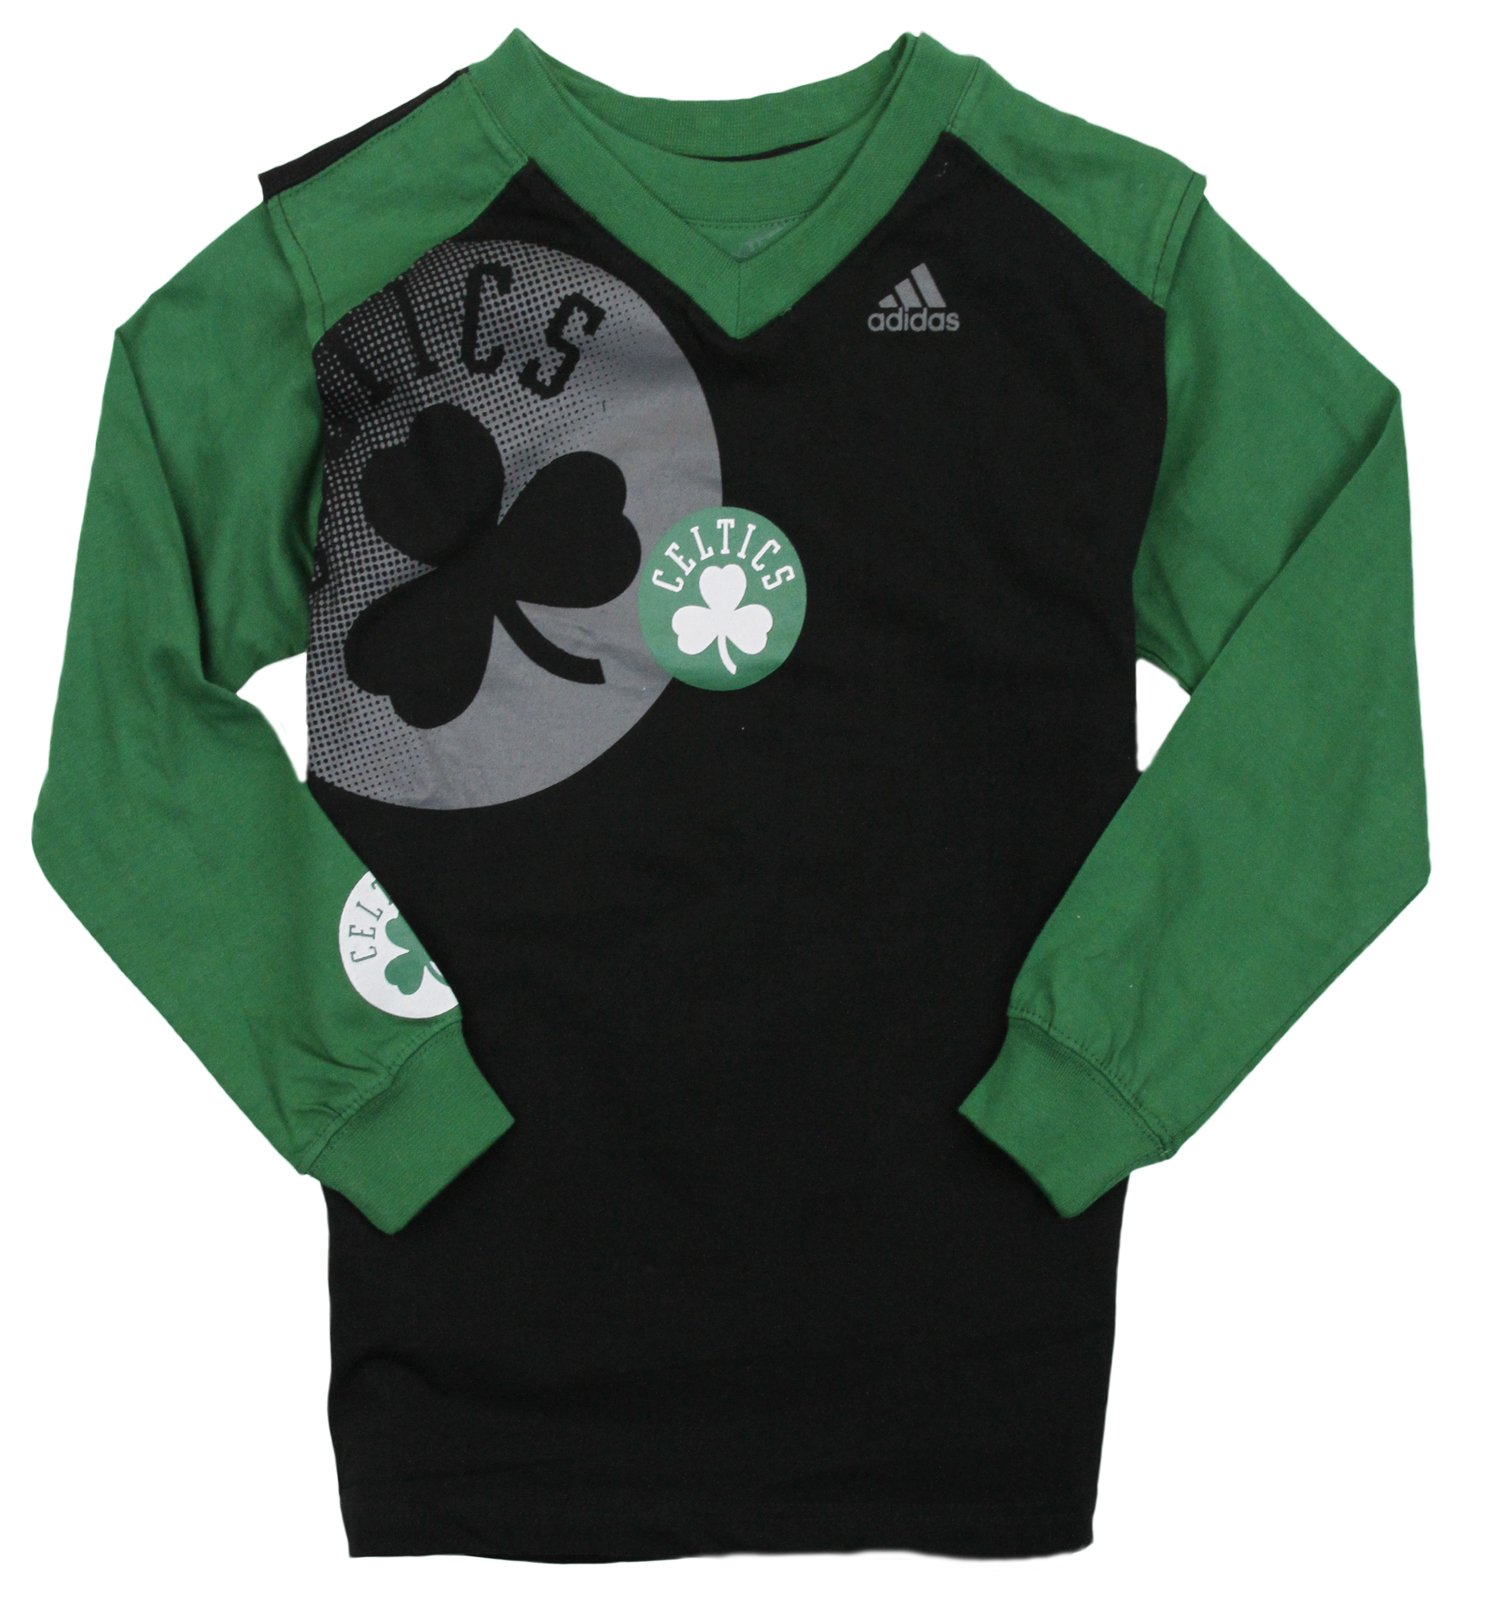 Adidas NBA Basketball Youth Boys Boston Celtics 3-in-1 Muscle Shirt, Black / Green